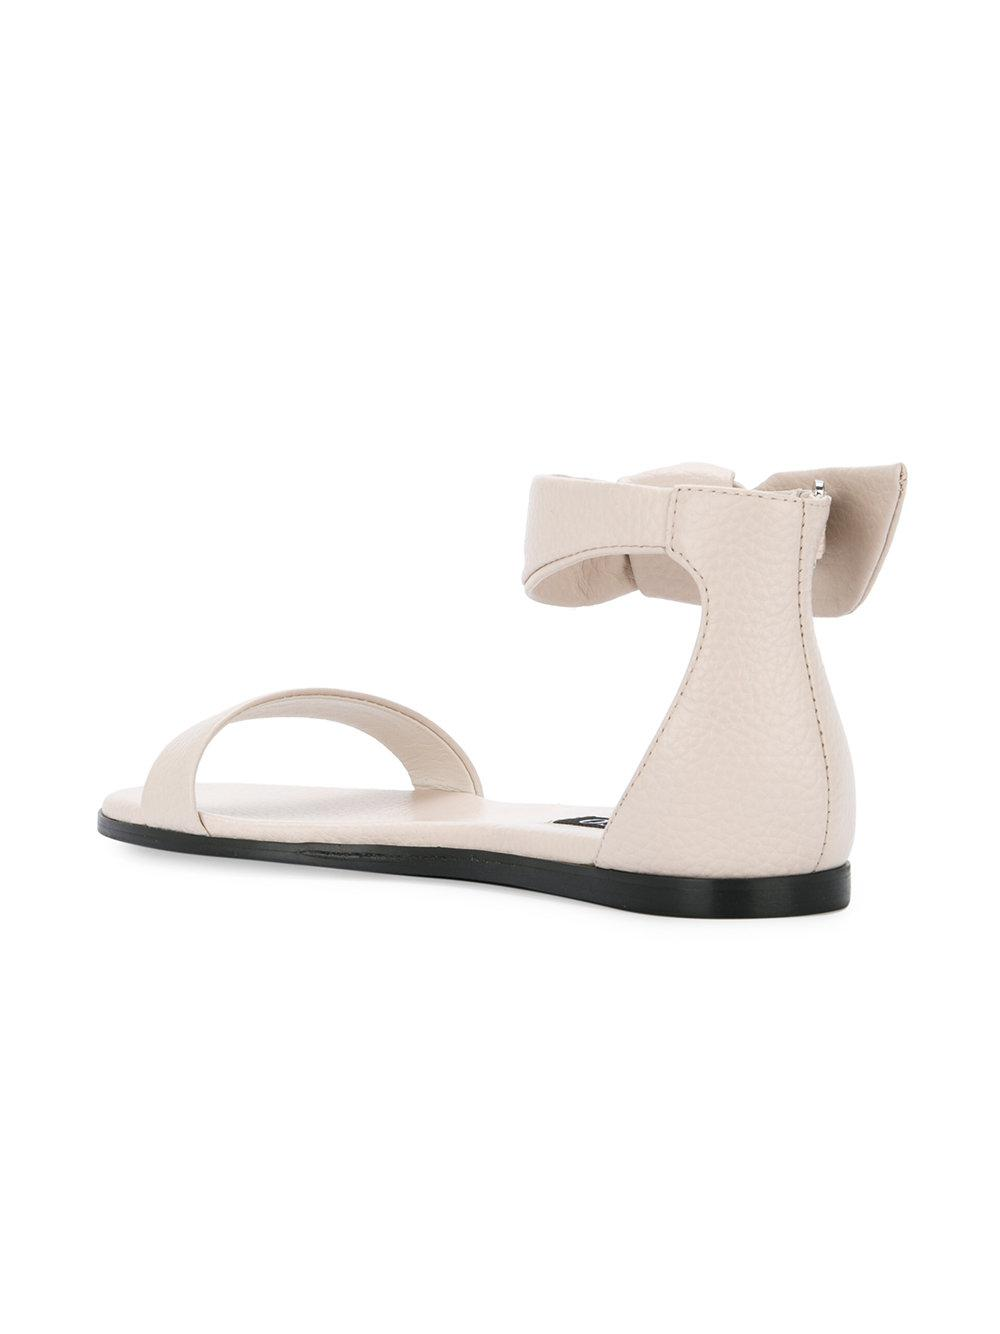 Senso Sandales Plates - Fraser Noir WSh4he